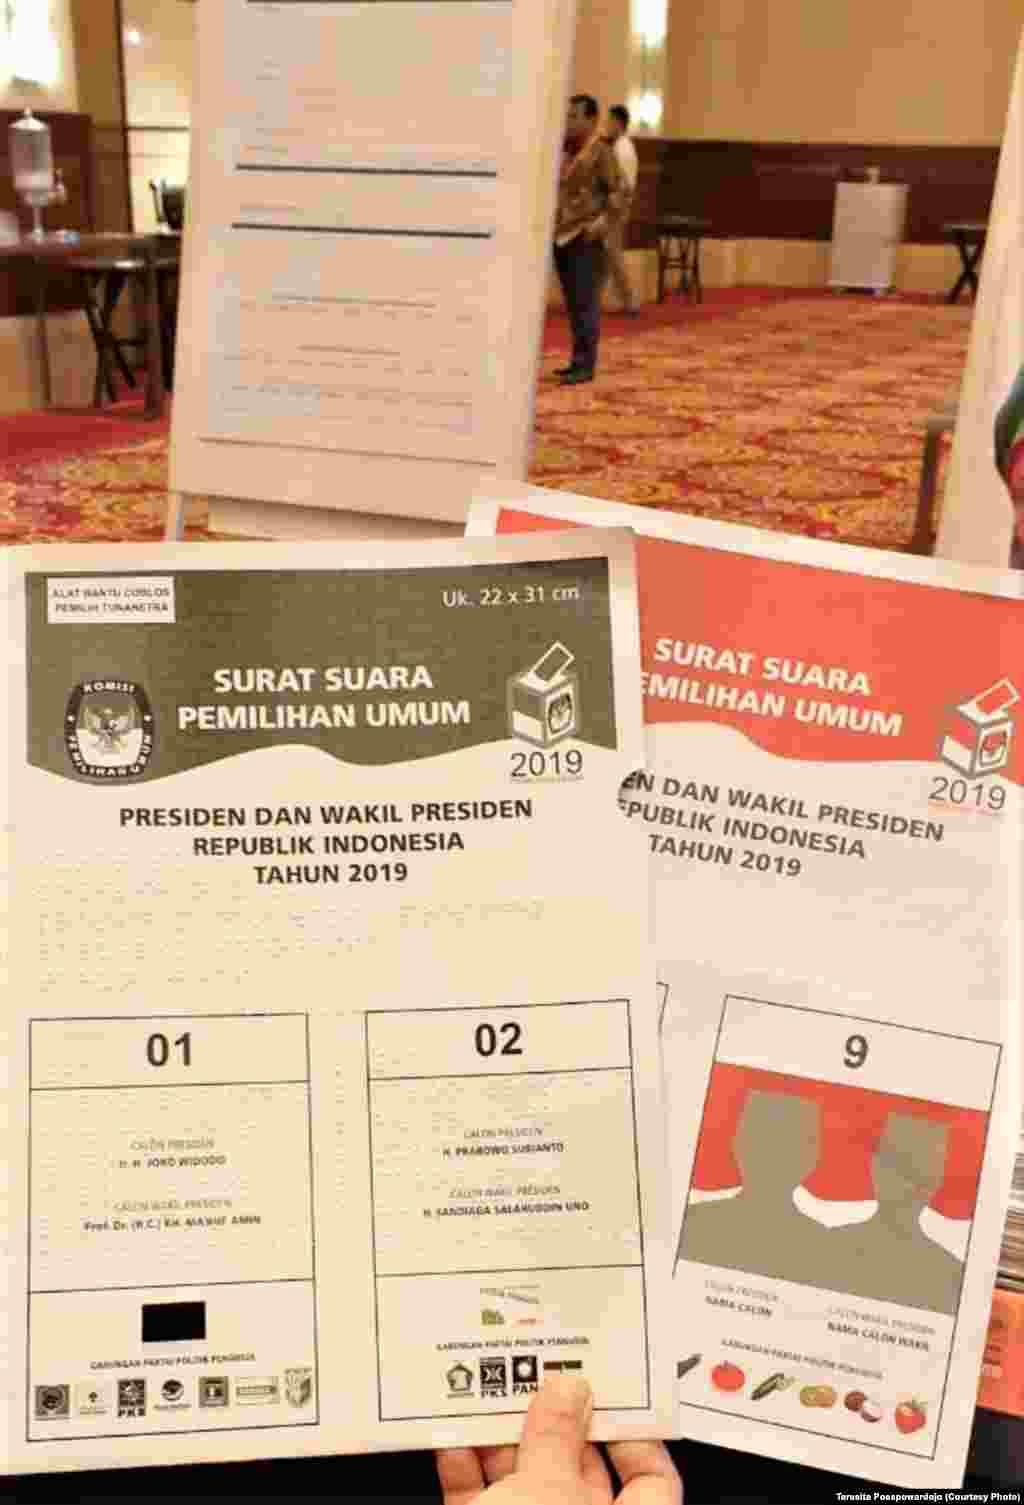 Surat suara Braille untuk pemilih tuna netra dalam taklimat yang digelar oleh Komisi Pemilihan Umum untuk para pemantau pemilu, di Jakarta, 16 April 2019. (Foto: Teresita Poespowardojo)